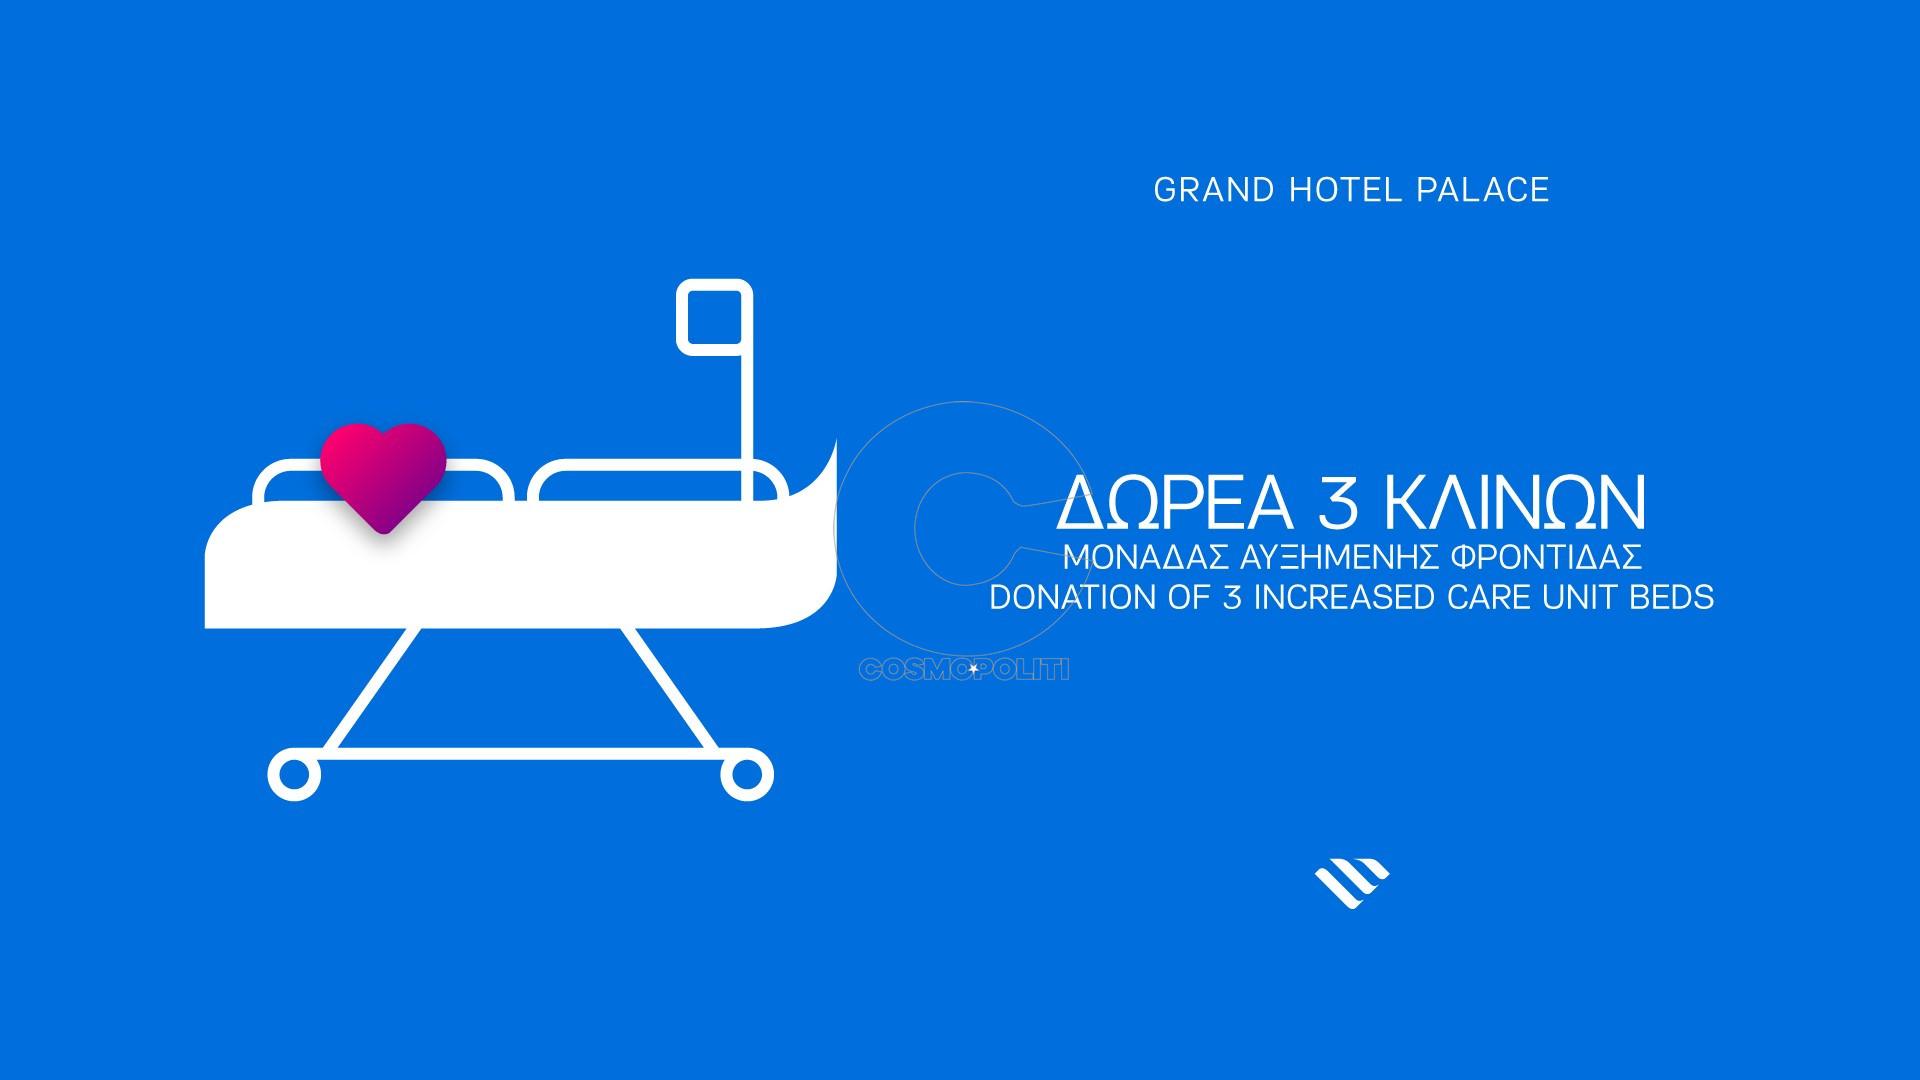 Grand Hotel Palace - Δωρεά Κλινών Μονάδας Αυξημένης Φροντίδας